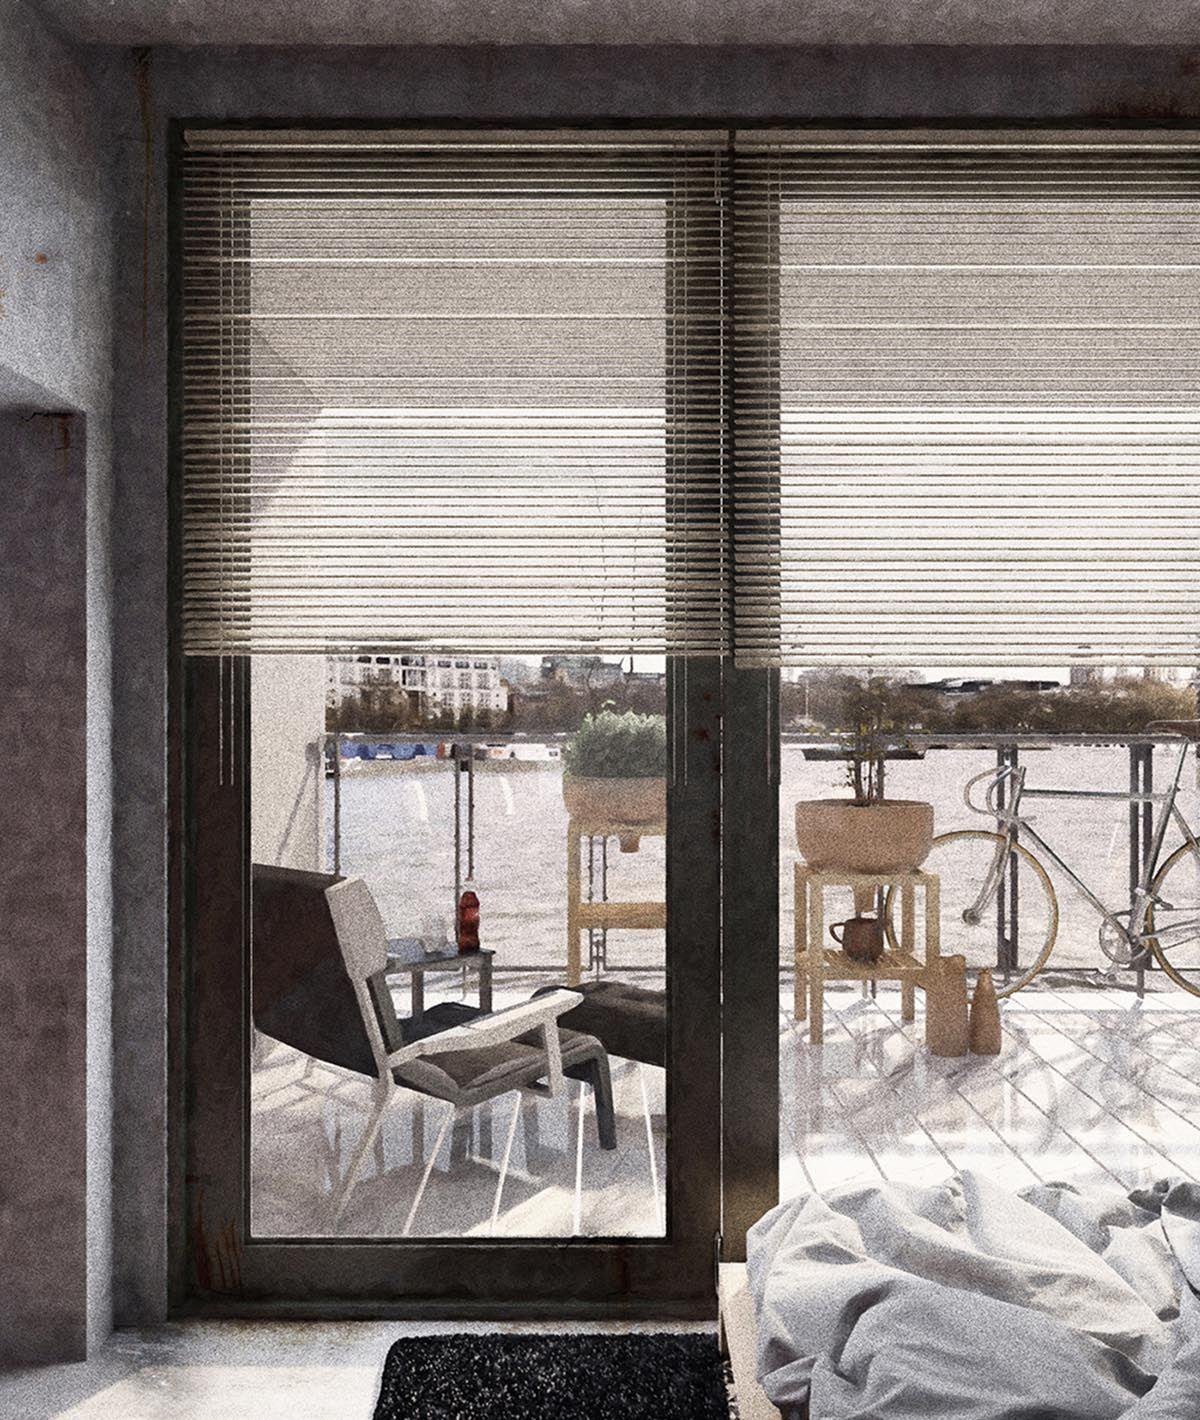 World Architecture Community News